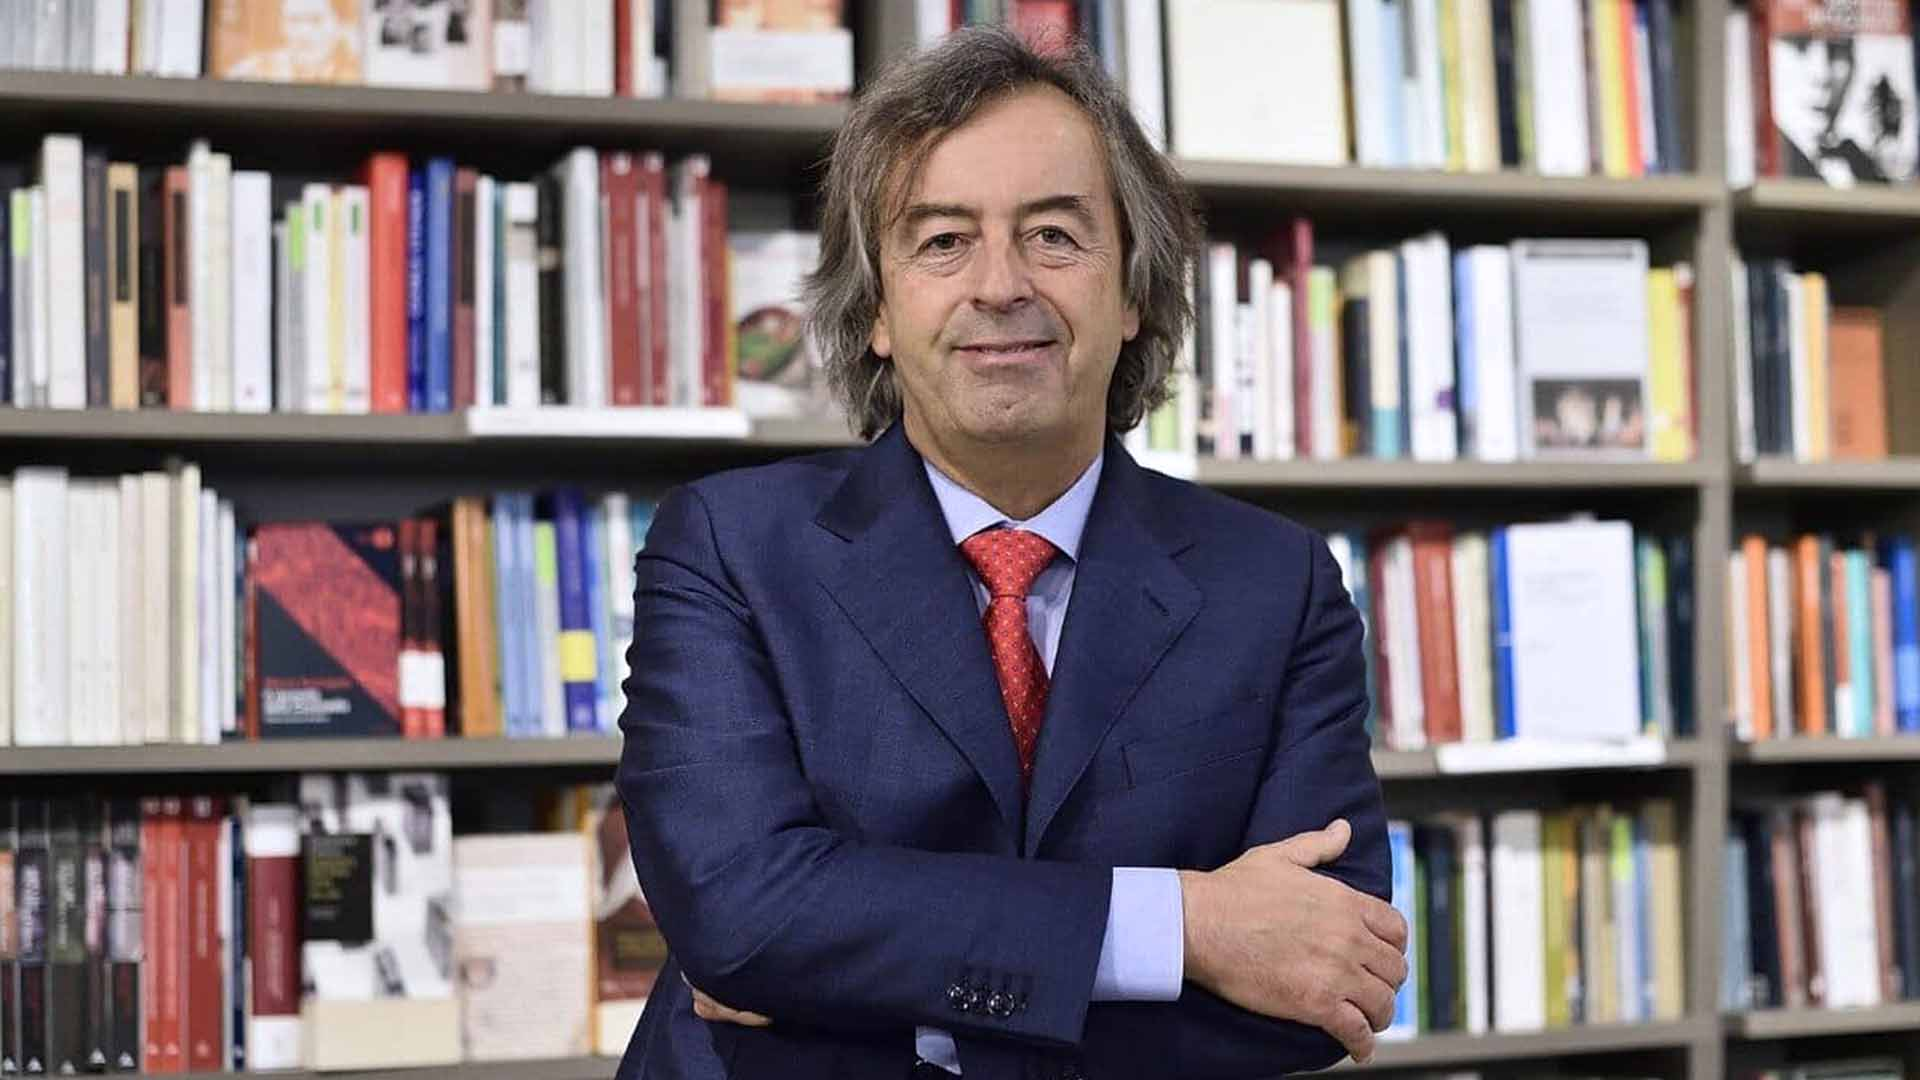 Il professor Roberto Burioni